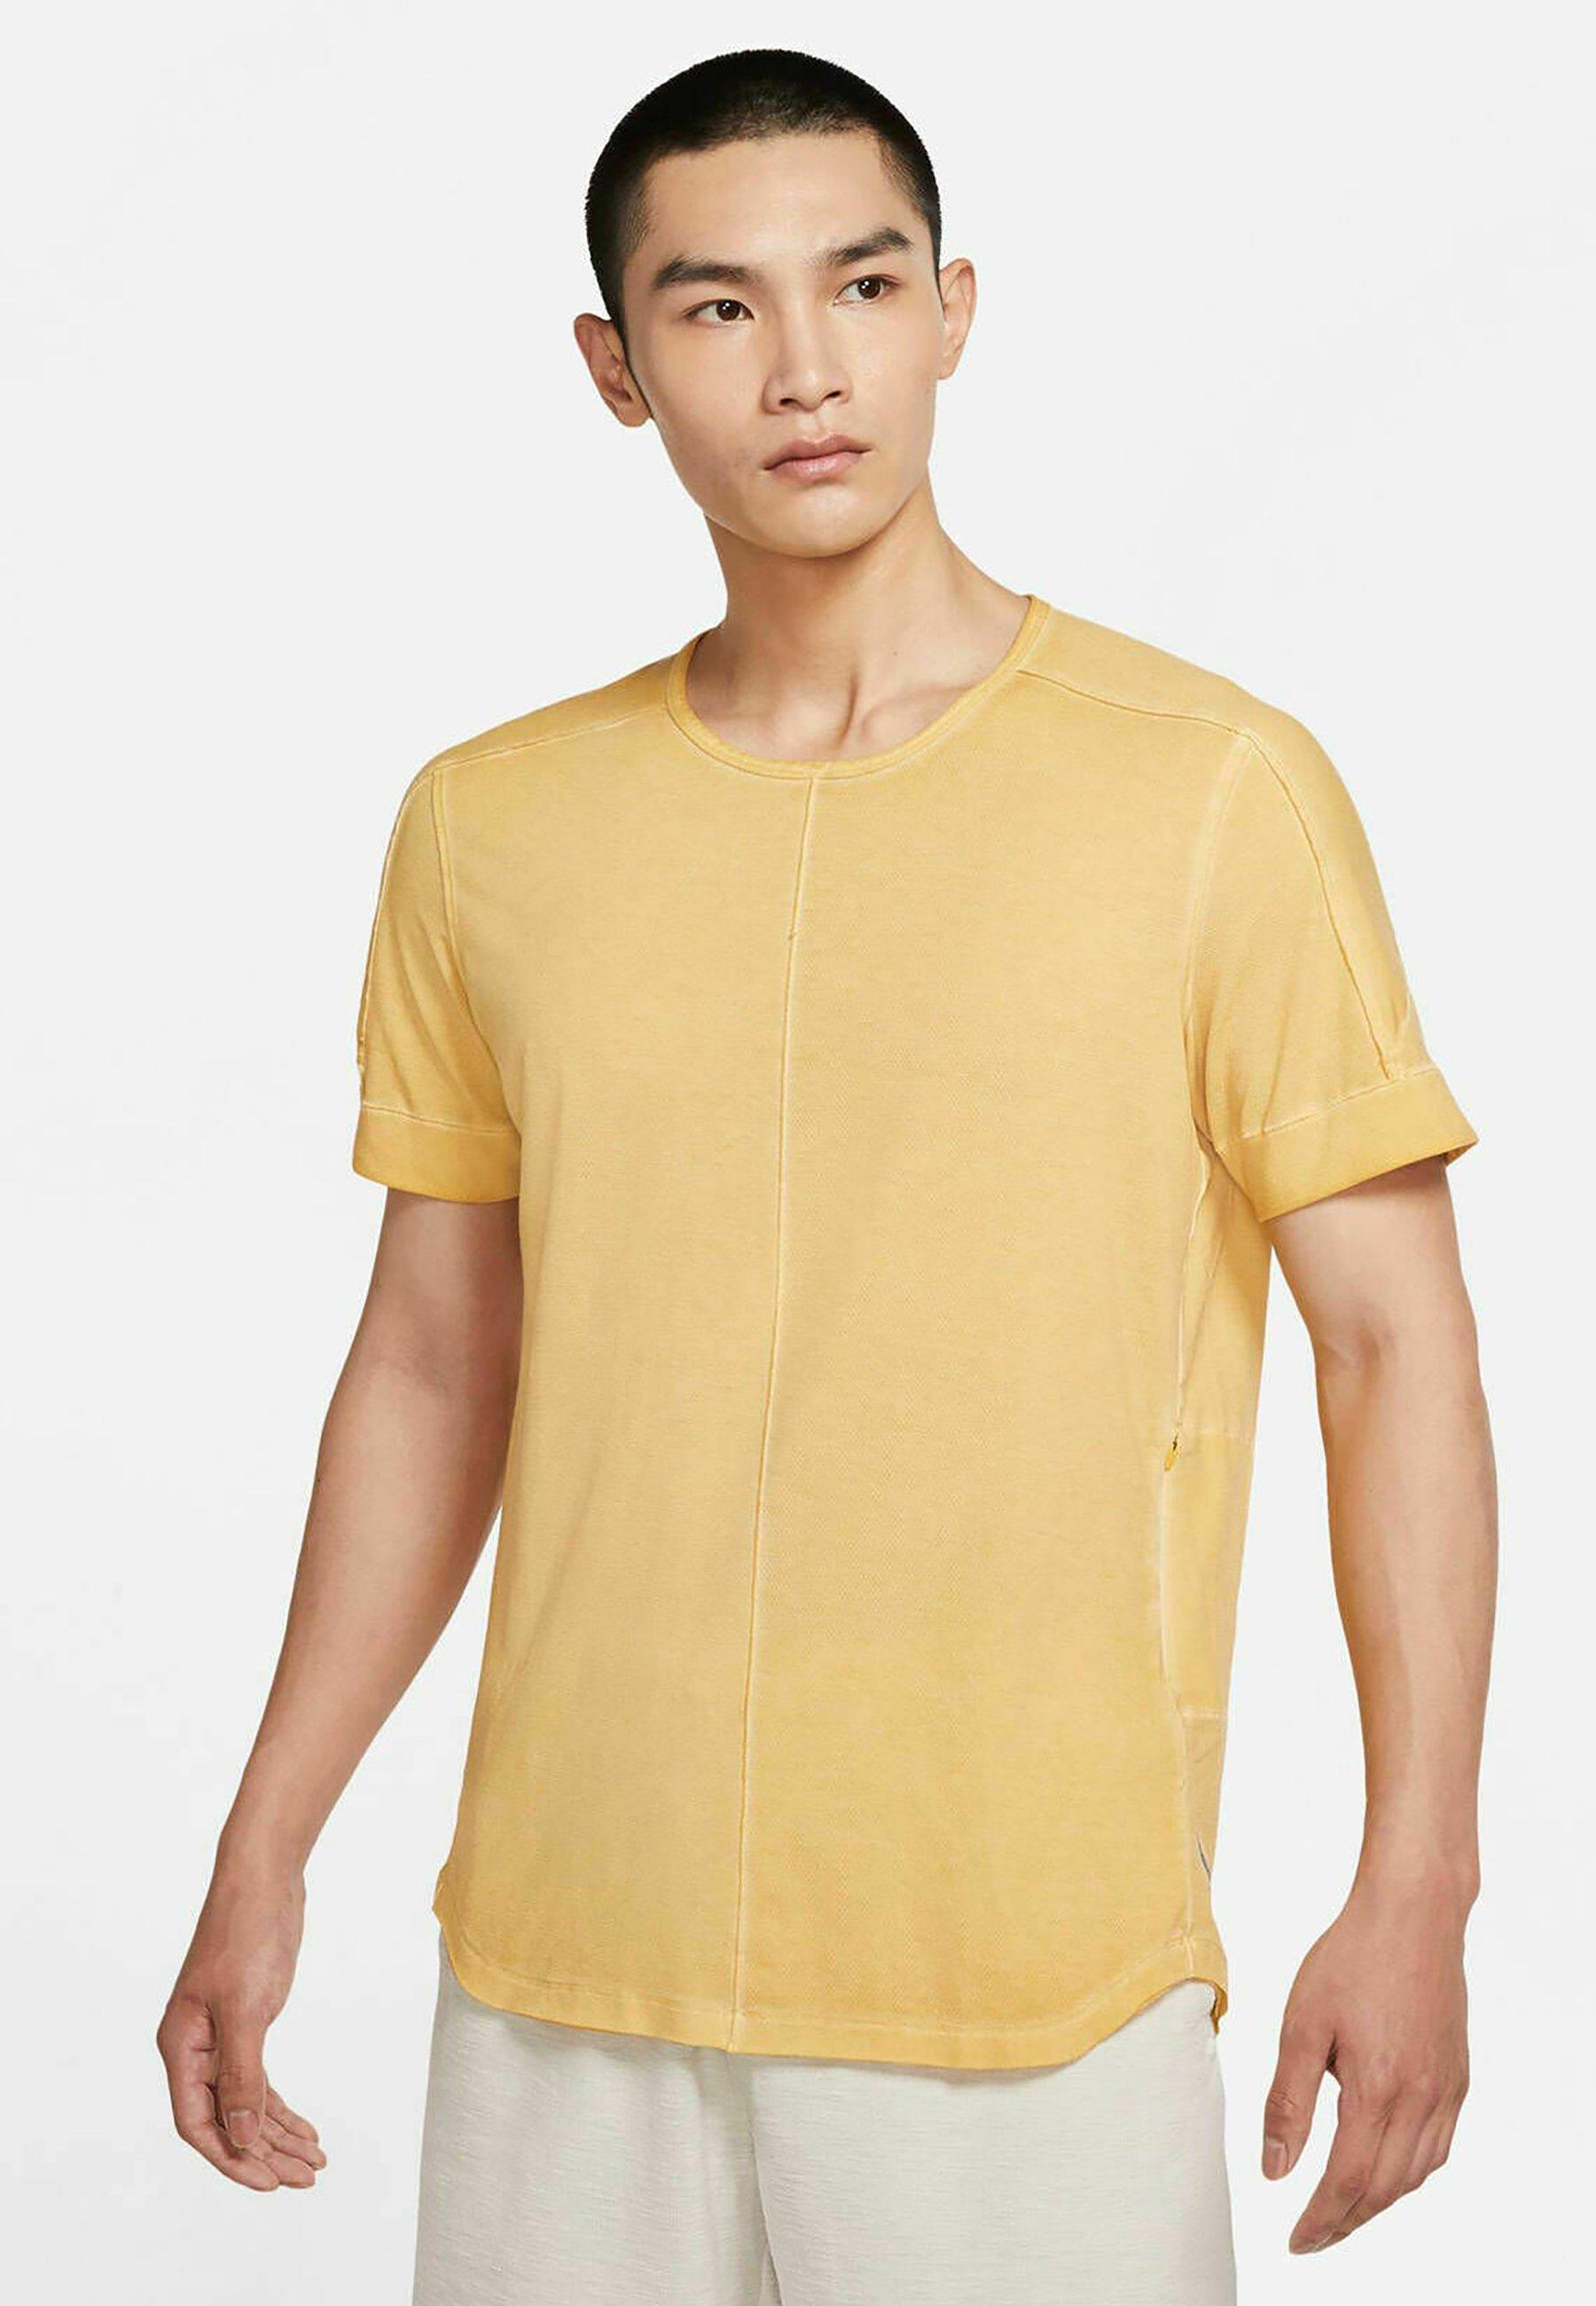 Uomo HERREN YOGA KURZARM - T-shirt basic